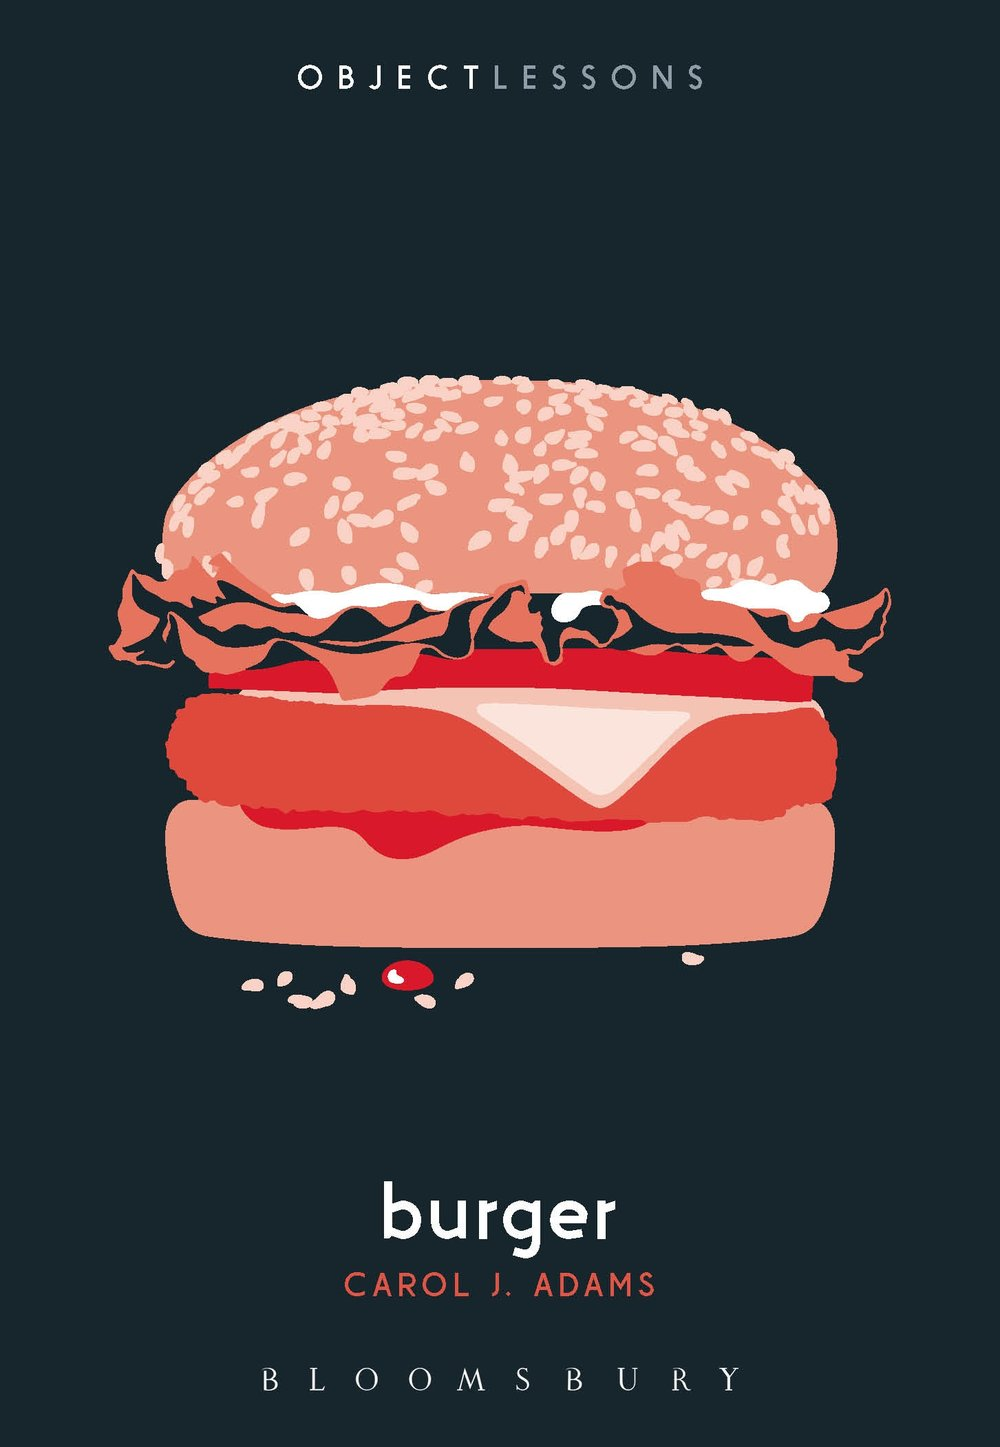 burger copy.jpg